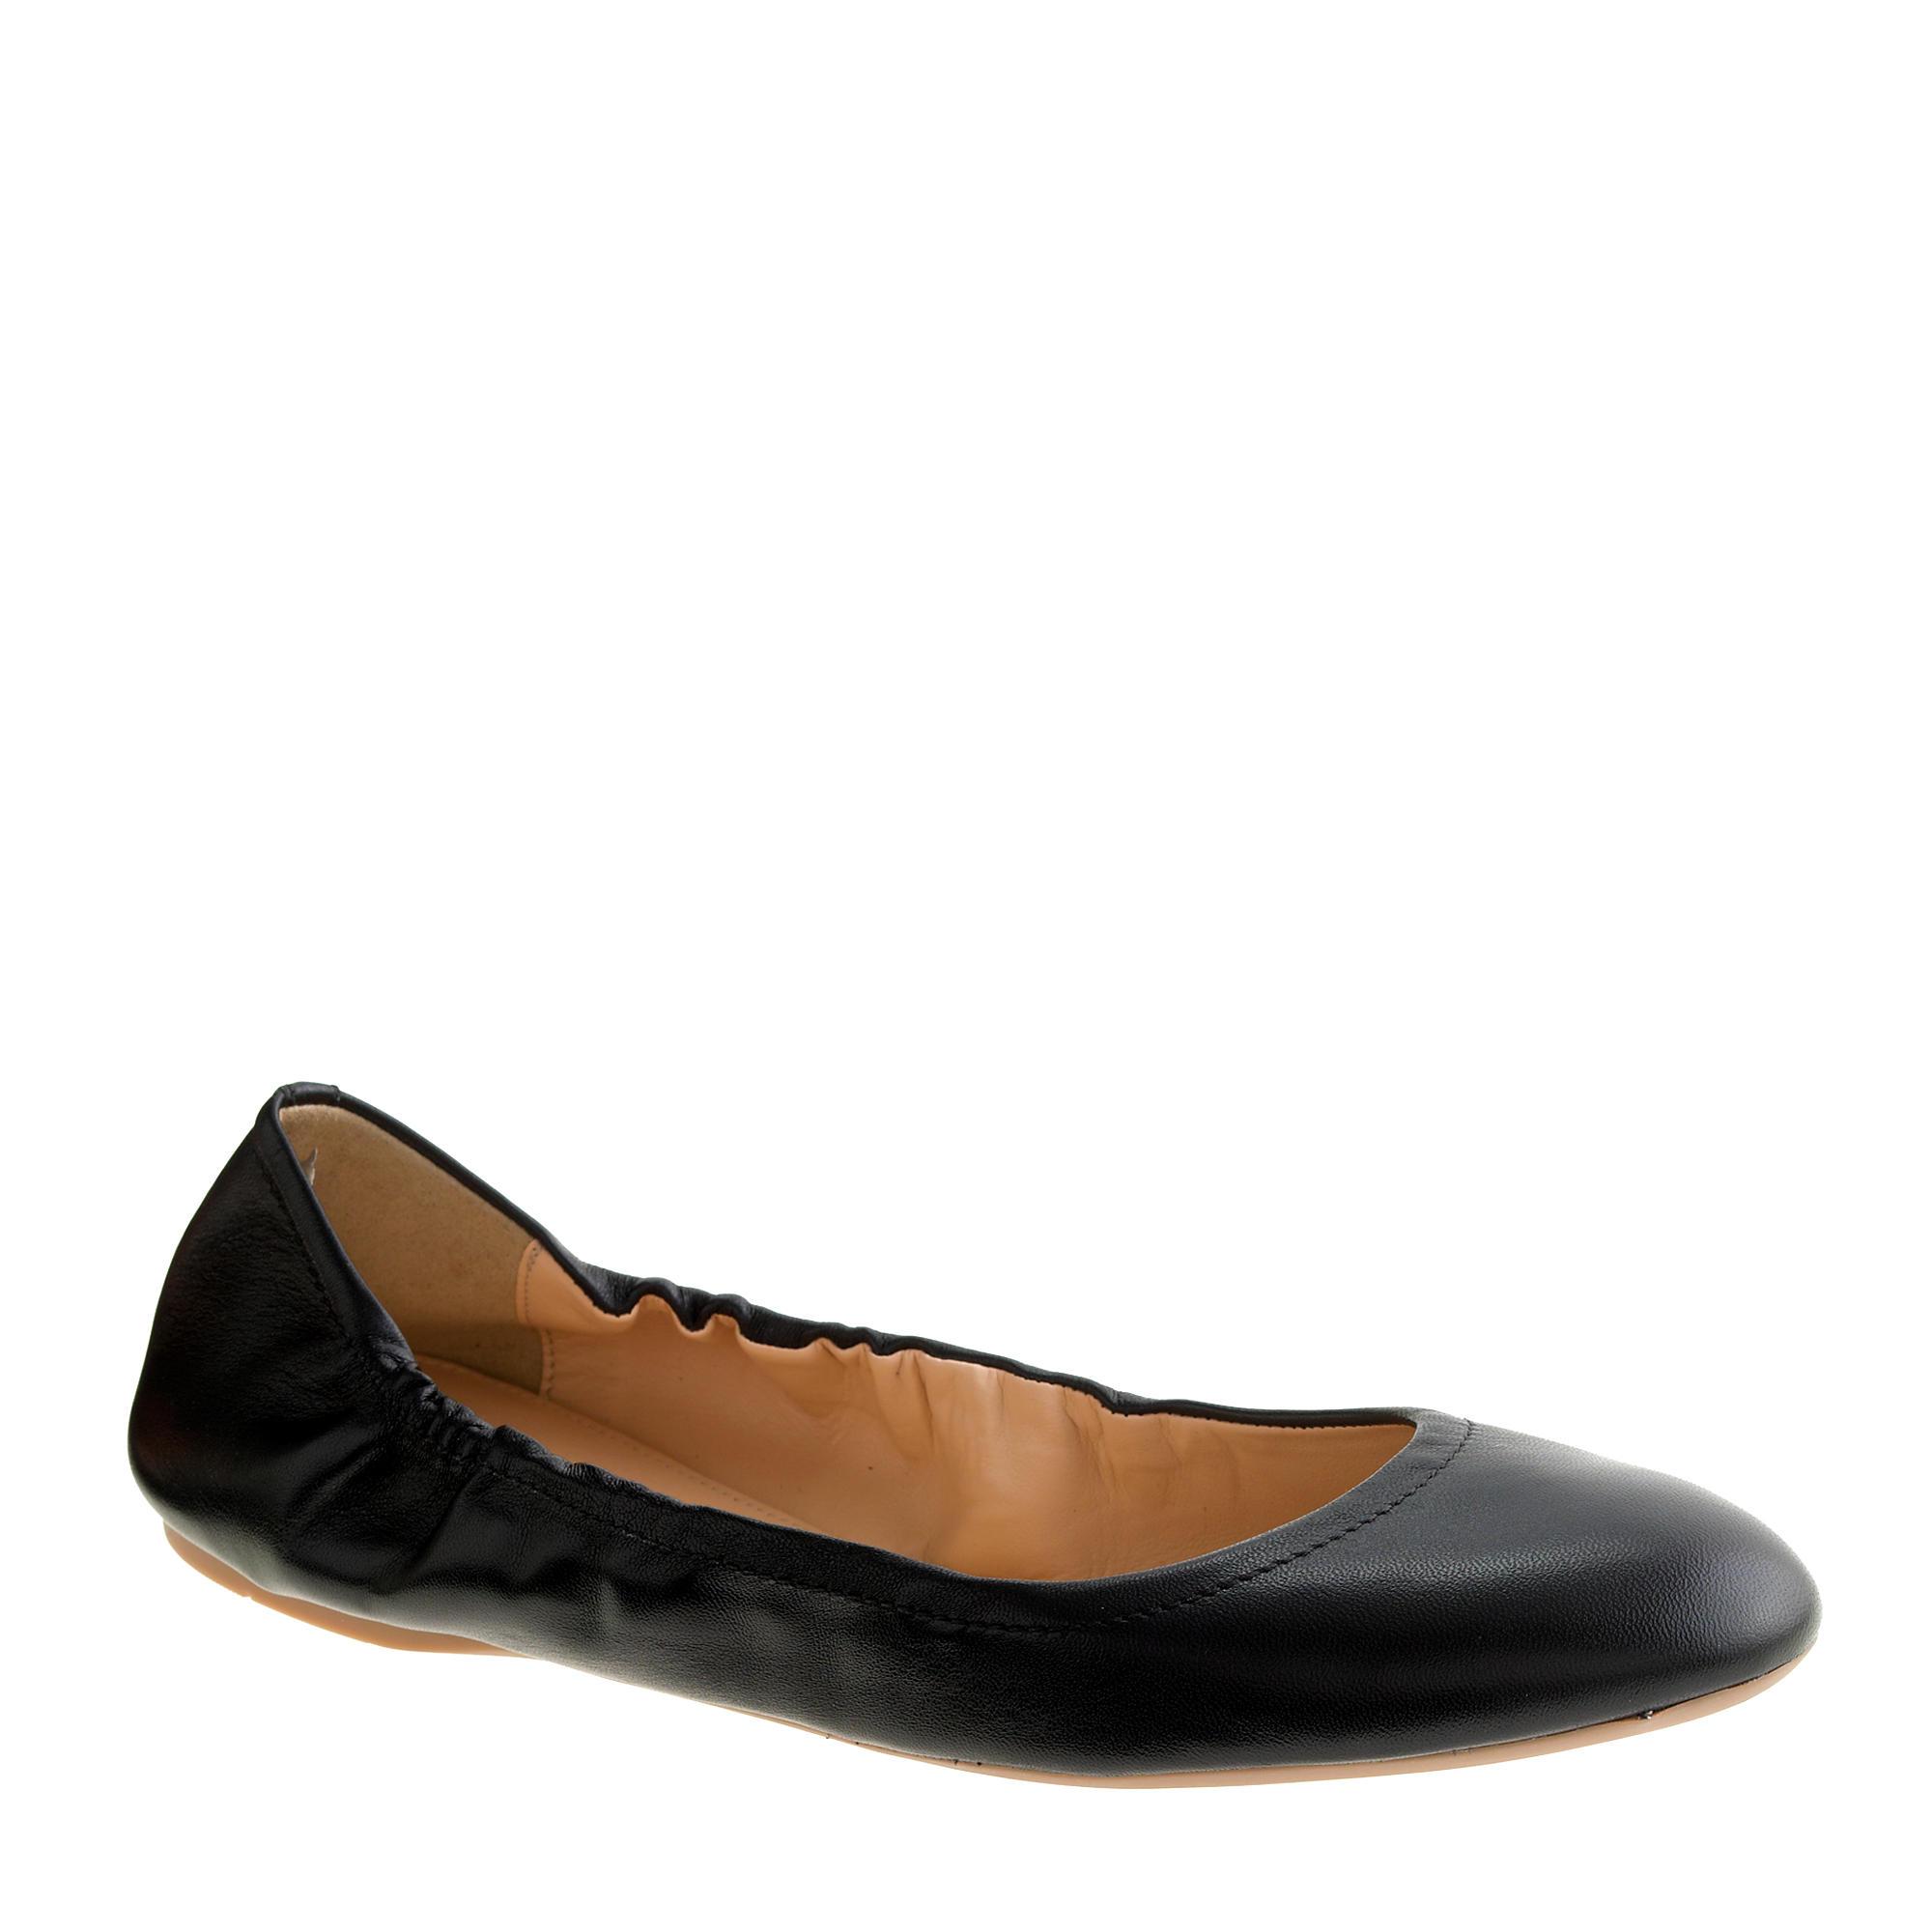 J Crew Ballet Flat Shoes